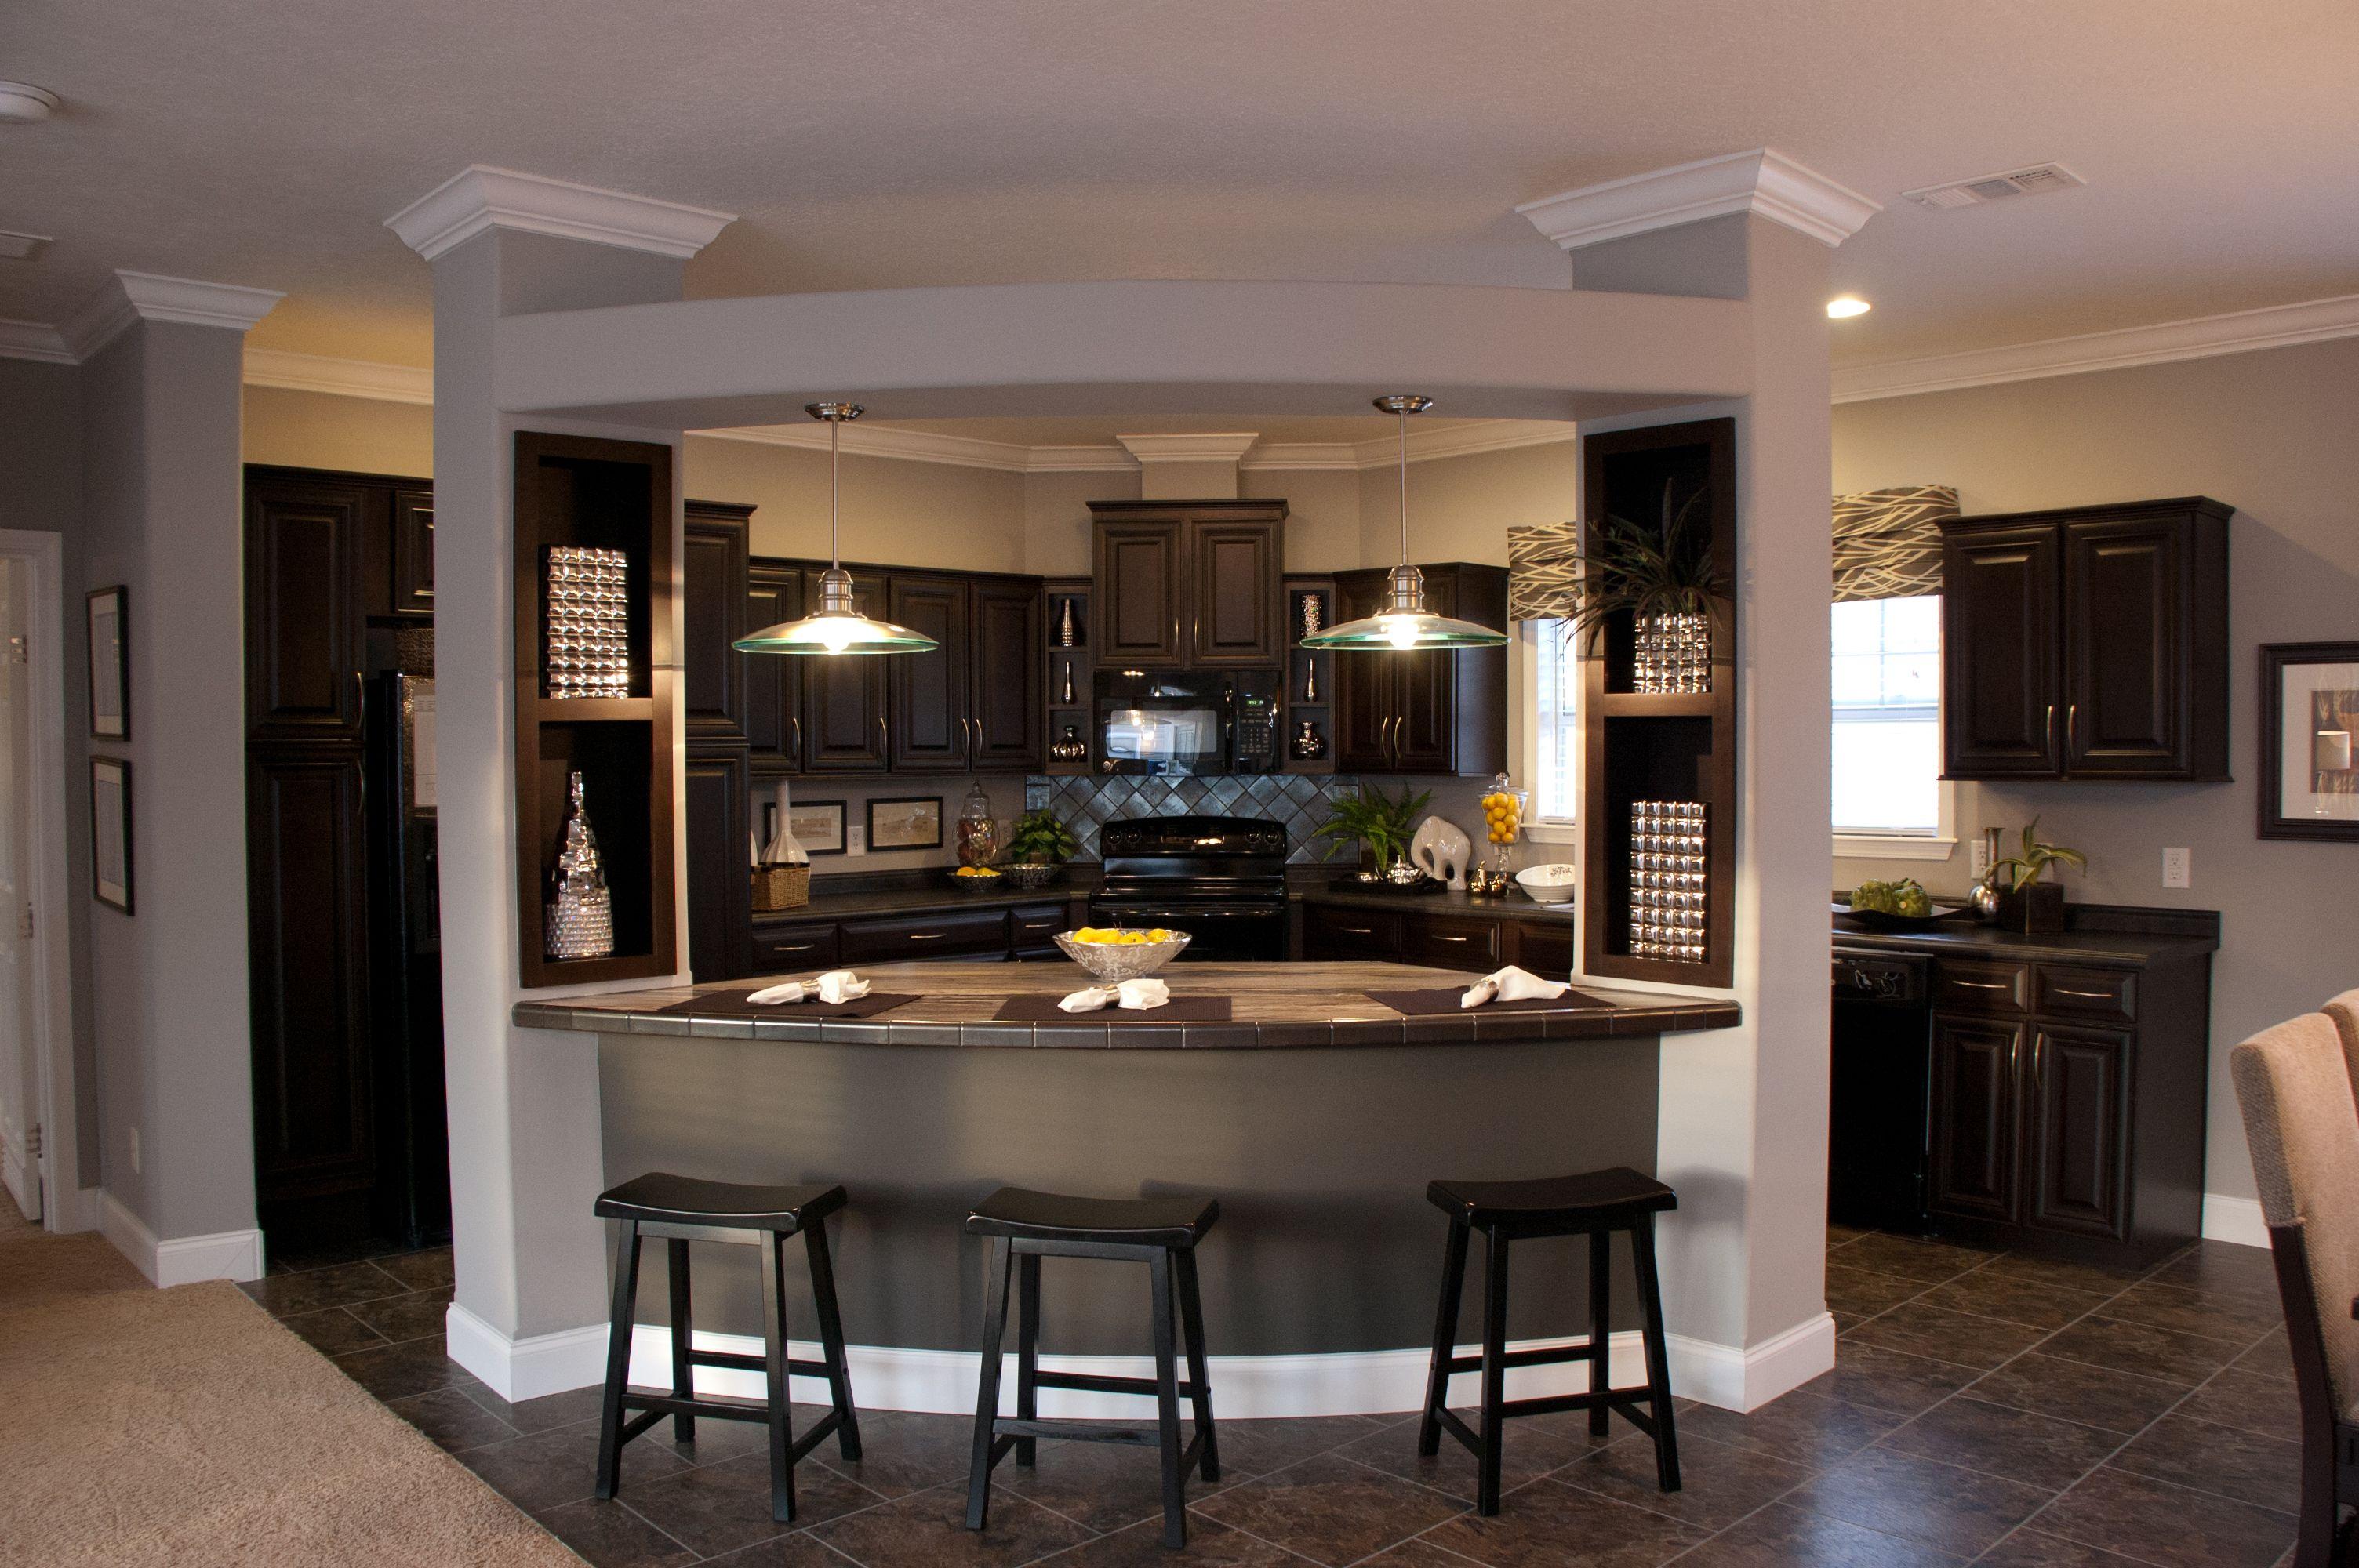 Bar elegante entre columnas house cocinas casas y hogar - Columnas decoracion interiores ...